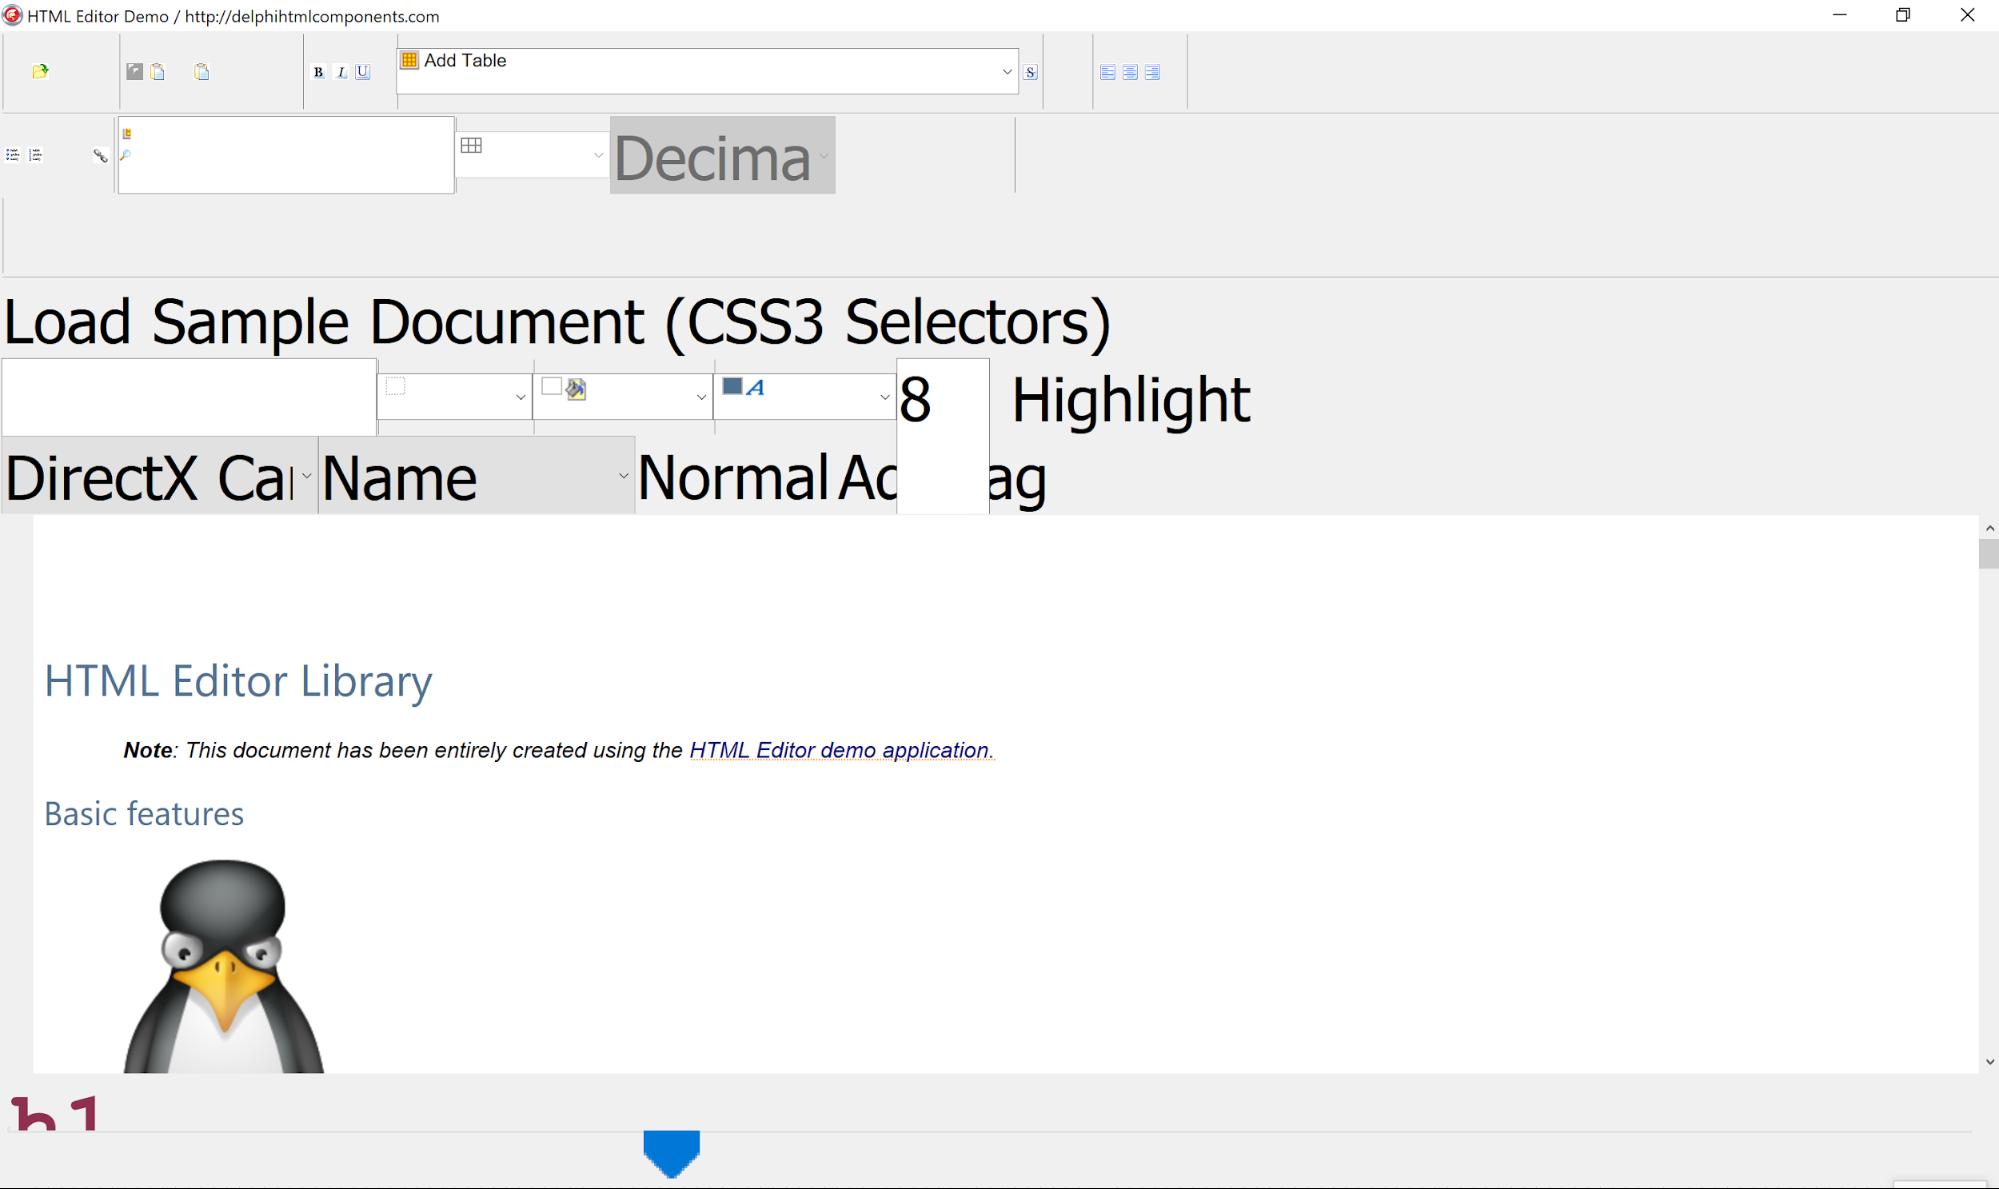 可视化报告生成器FastReport VCL功能指南:从Delphi / C ++ Builder / Lazarus创建HTML / HTML5分层文件